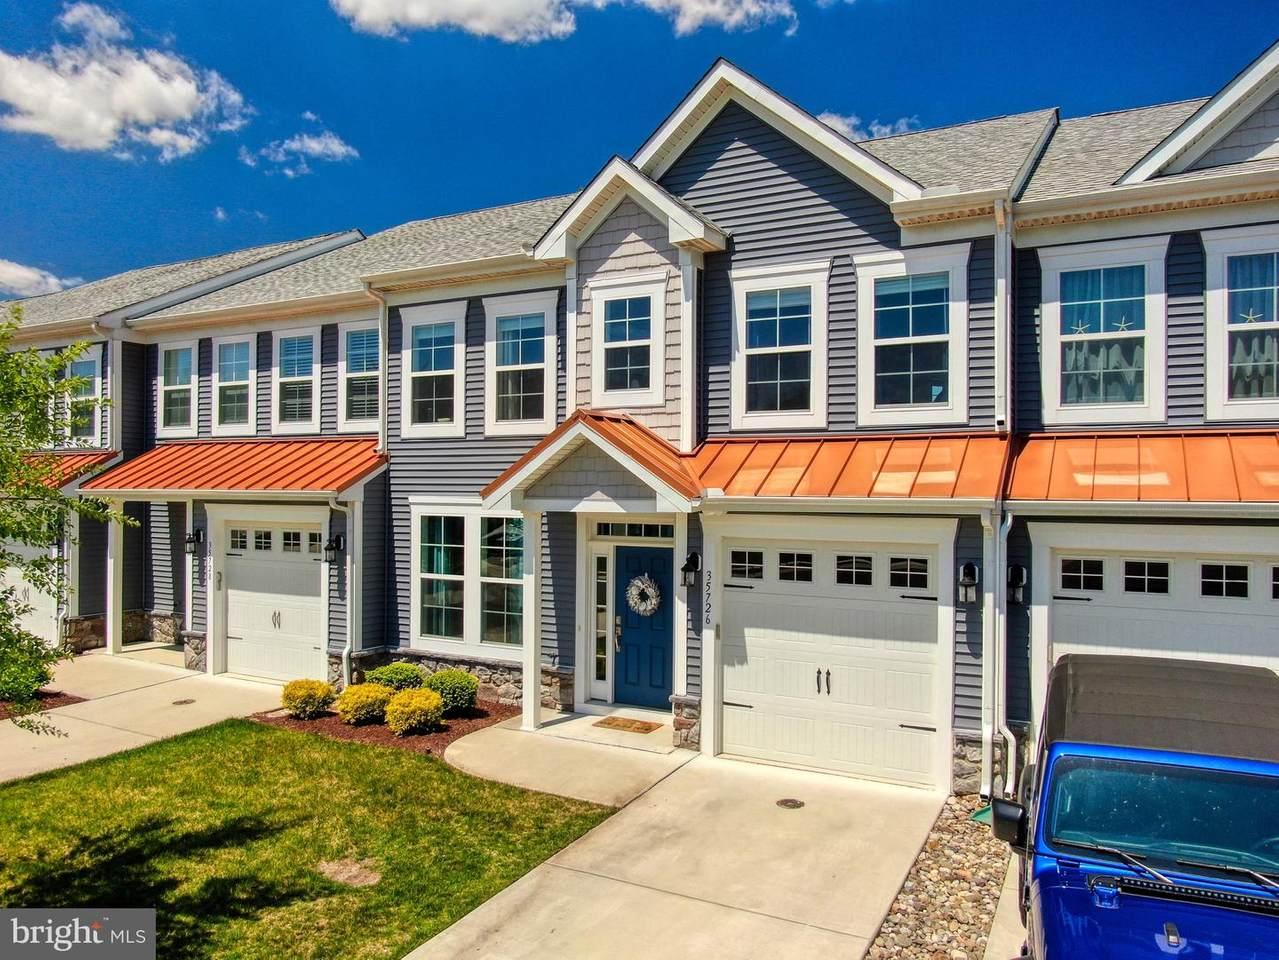 35726 Carmel Terrace - Photo 1